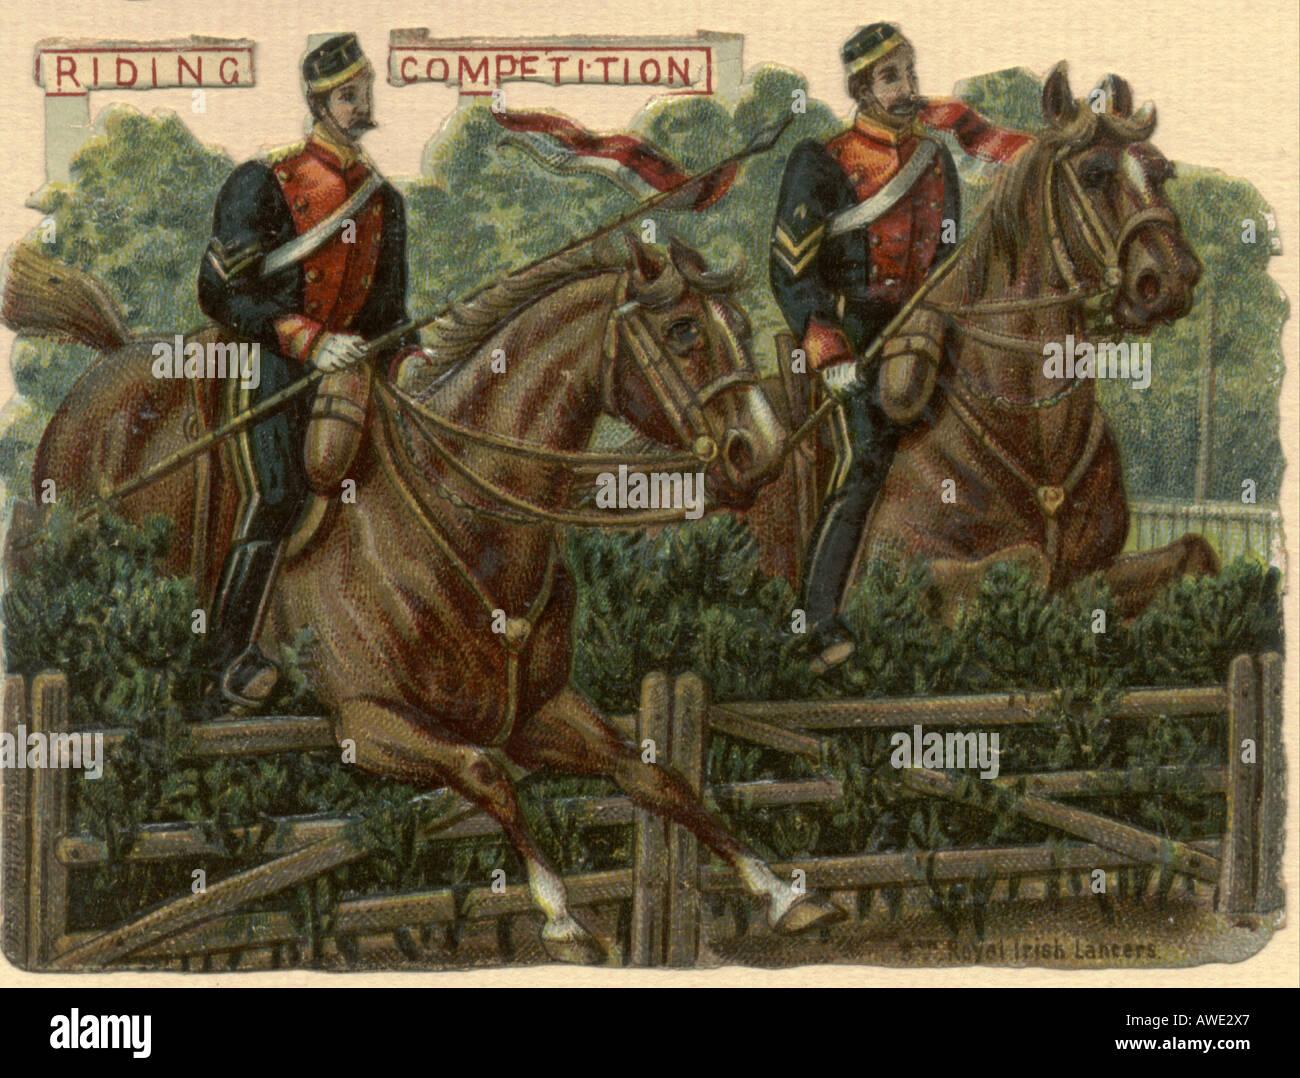 Royal Irish Lancers in Riding Competitition circa 1880 - Stock Image